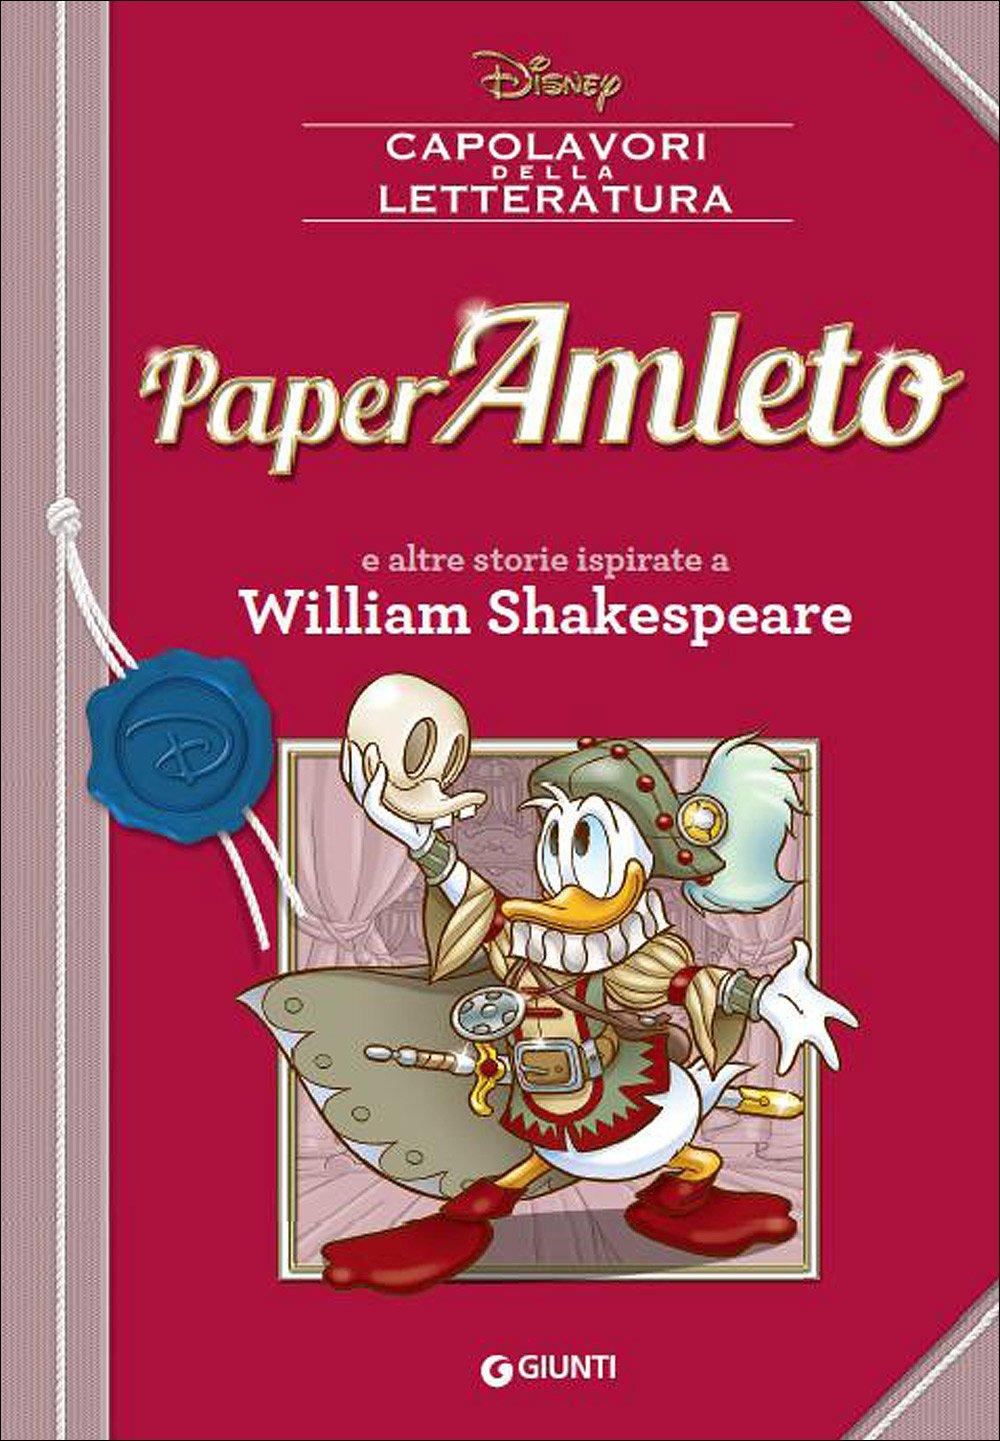 PaperAmleto